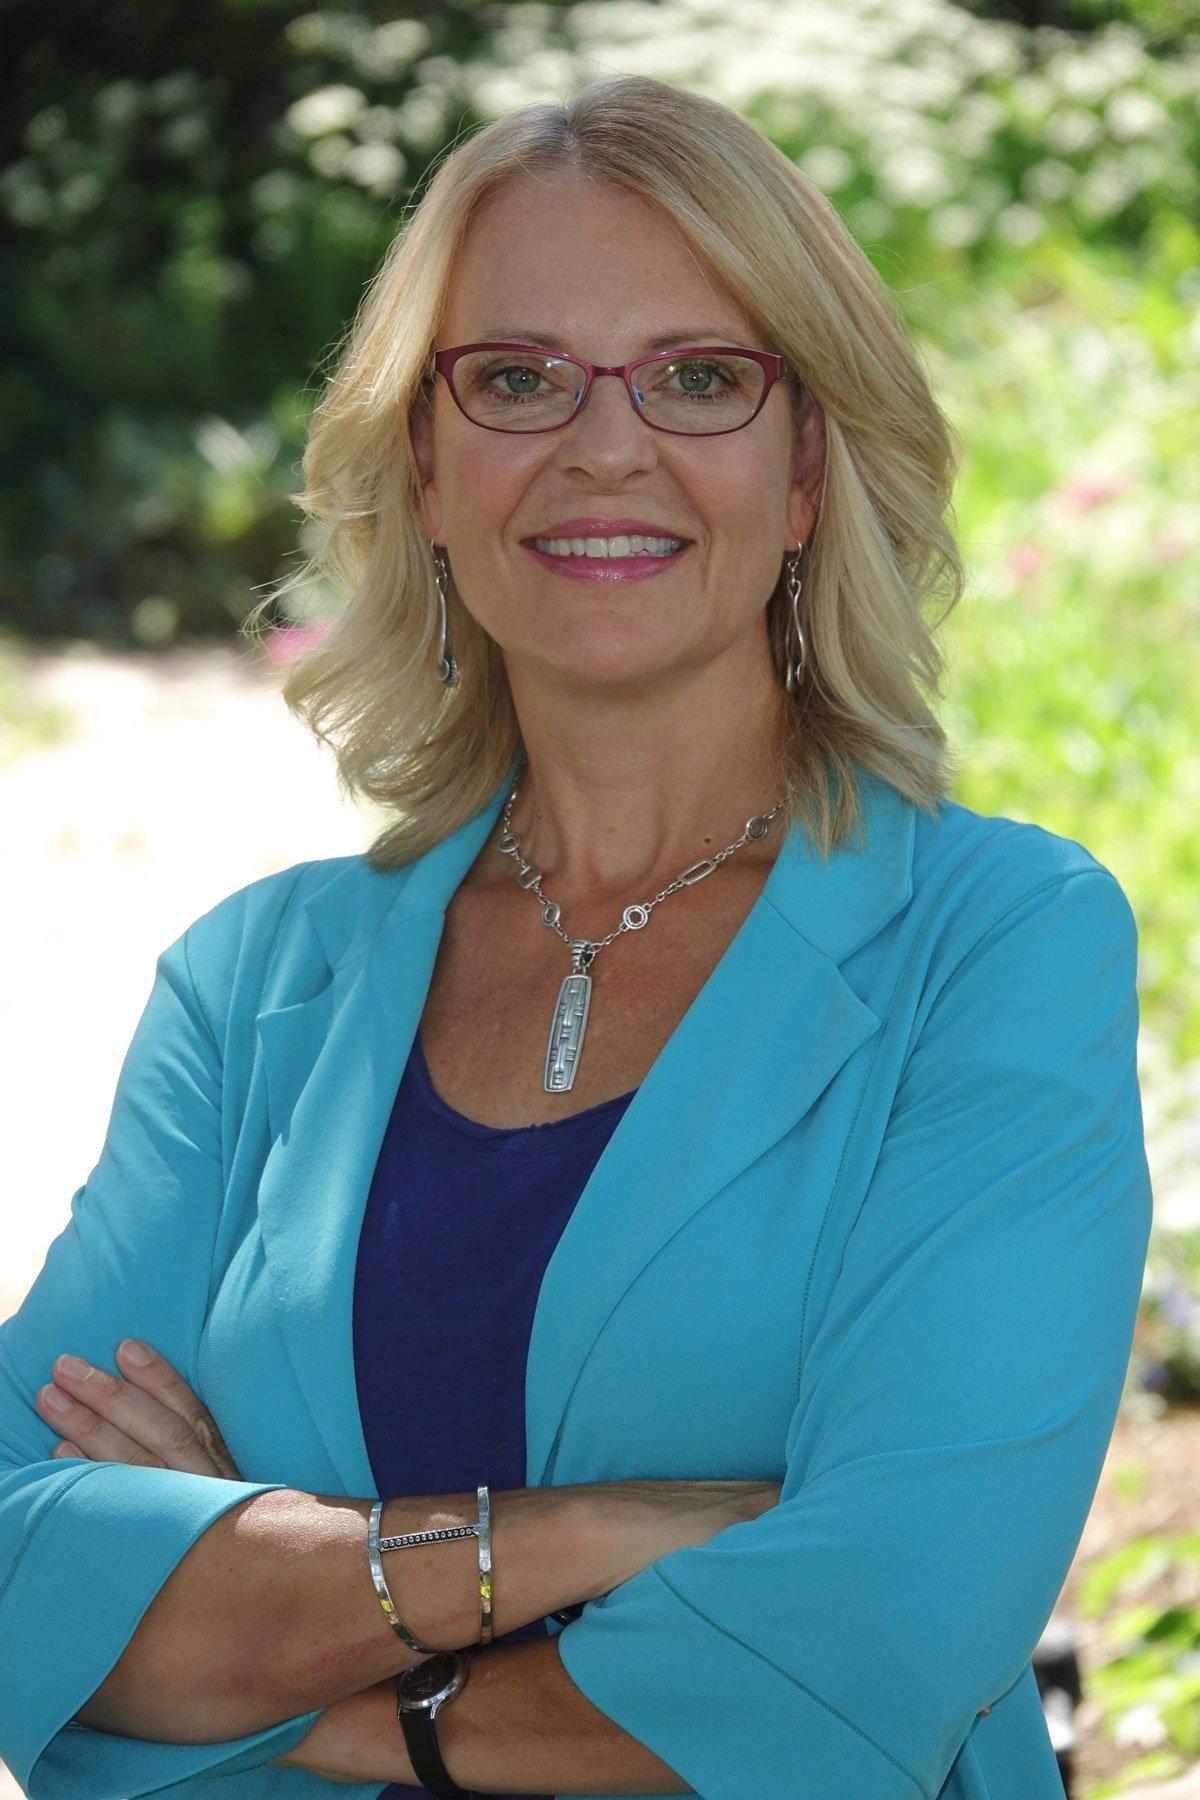 Reina Bach, Chief Executive Officer